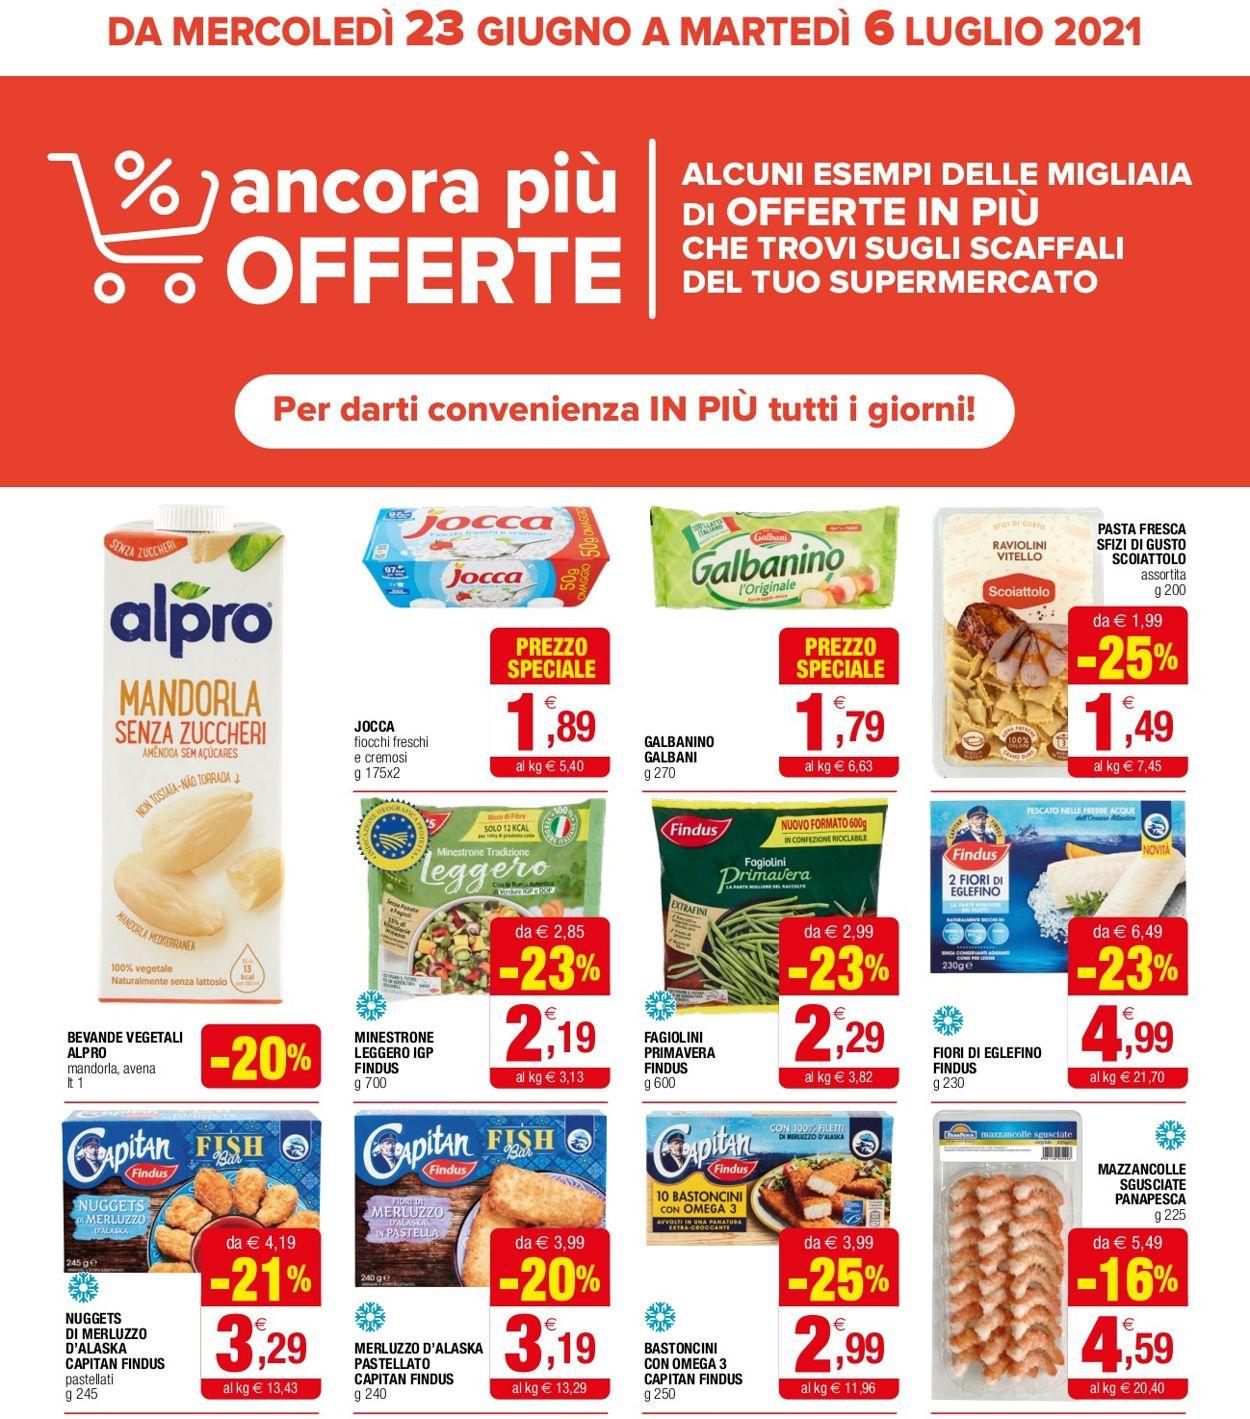 Volantino Iperal - Offerte 23/06-06/07/2021